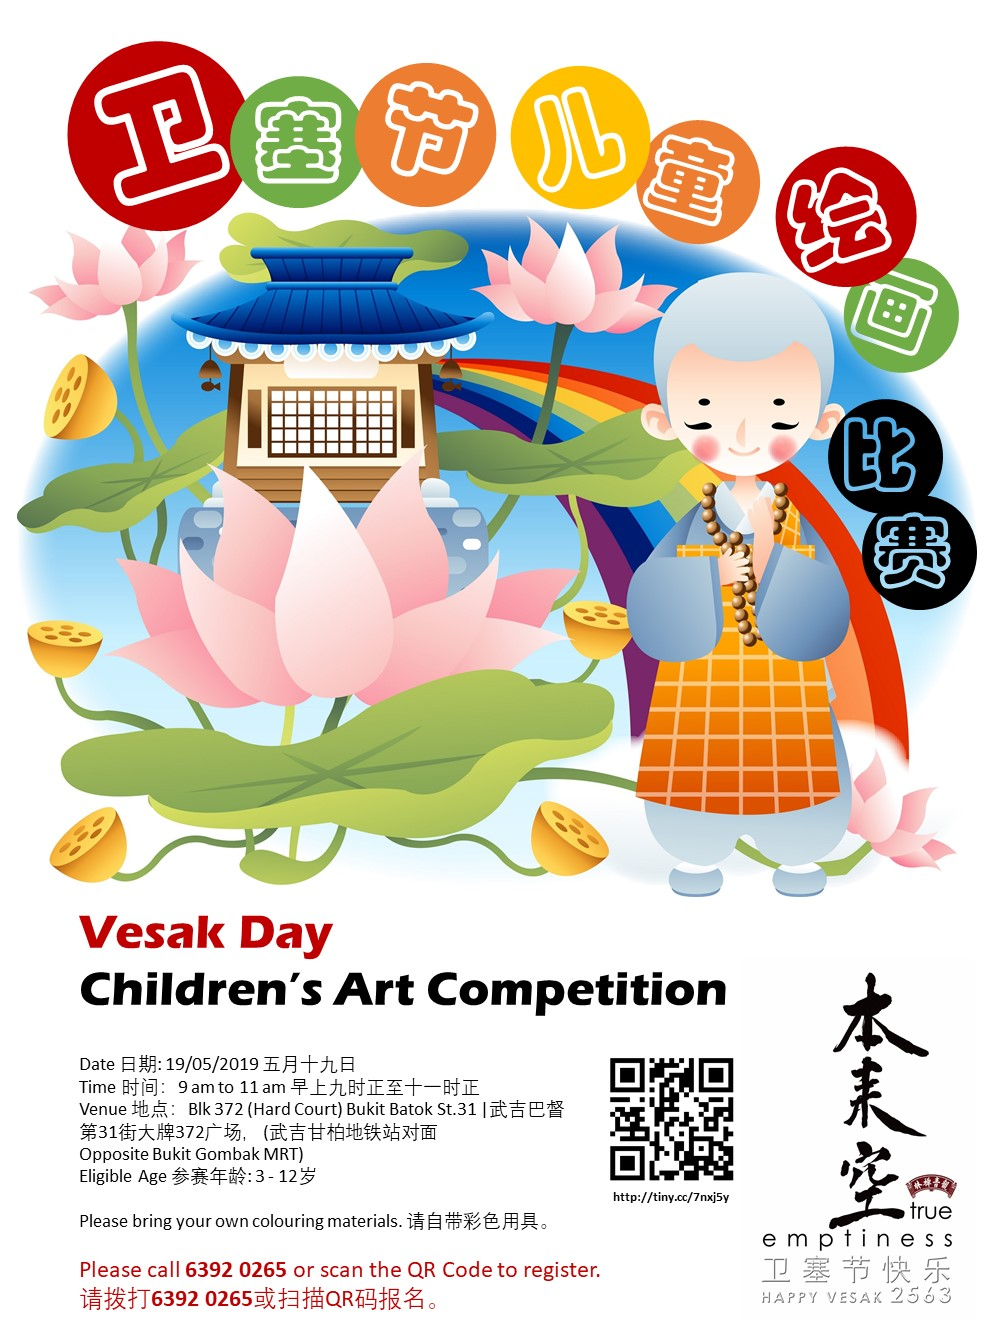 Children's Art Competition Poster.jpg